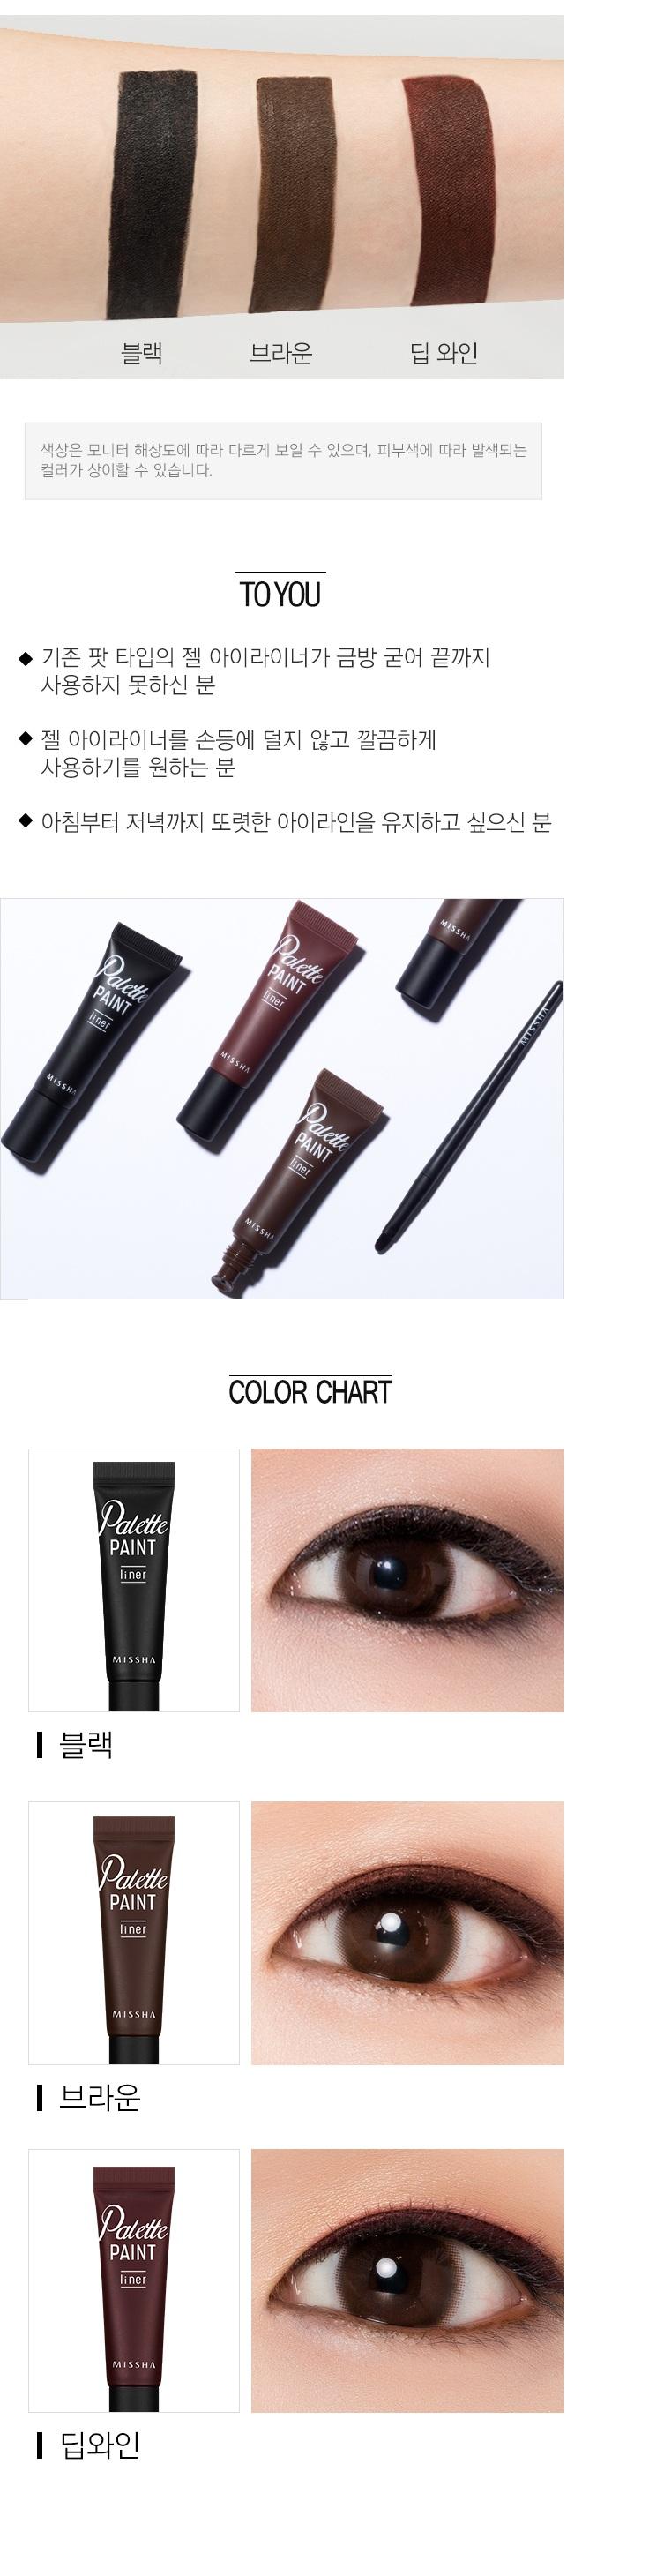 Missha Palette Paint Liner korean cosmetic online shop malaysia indonesia macau5